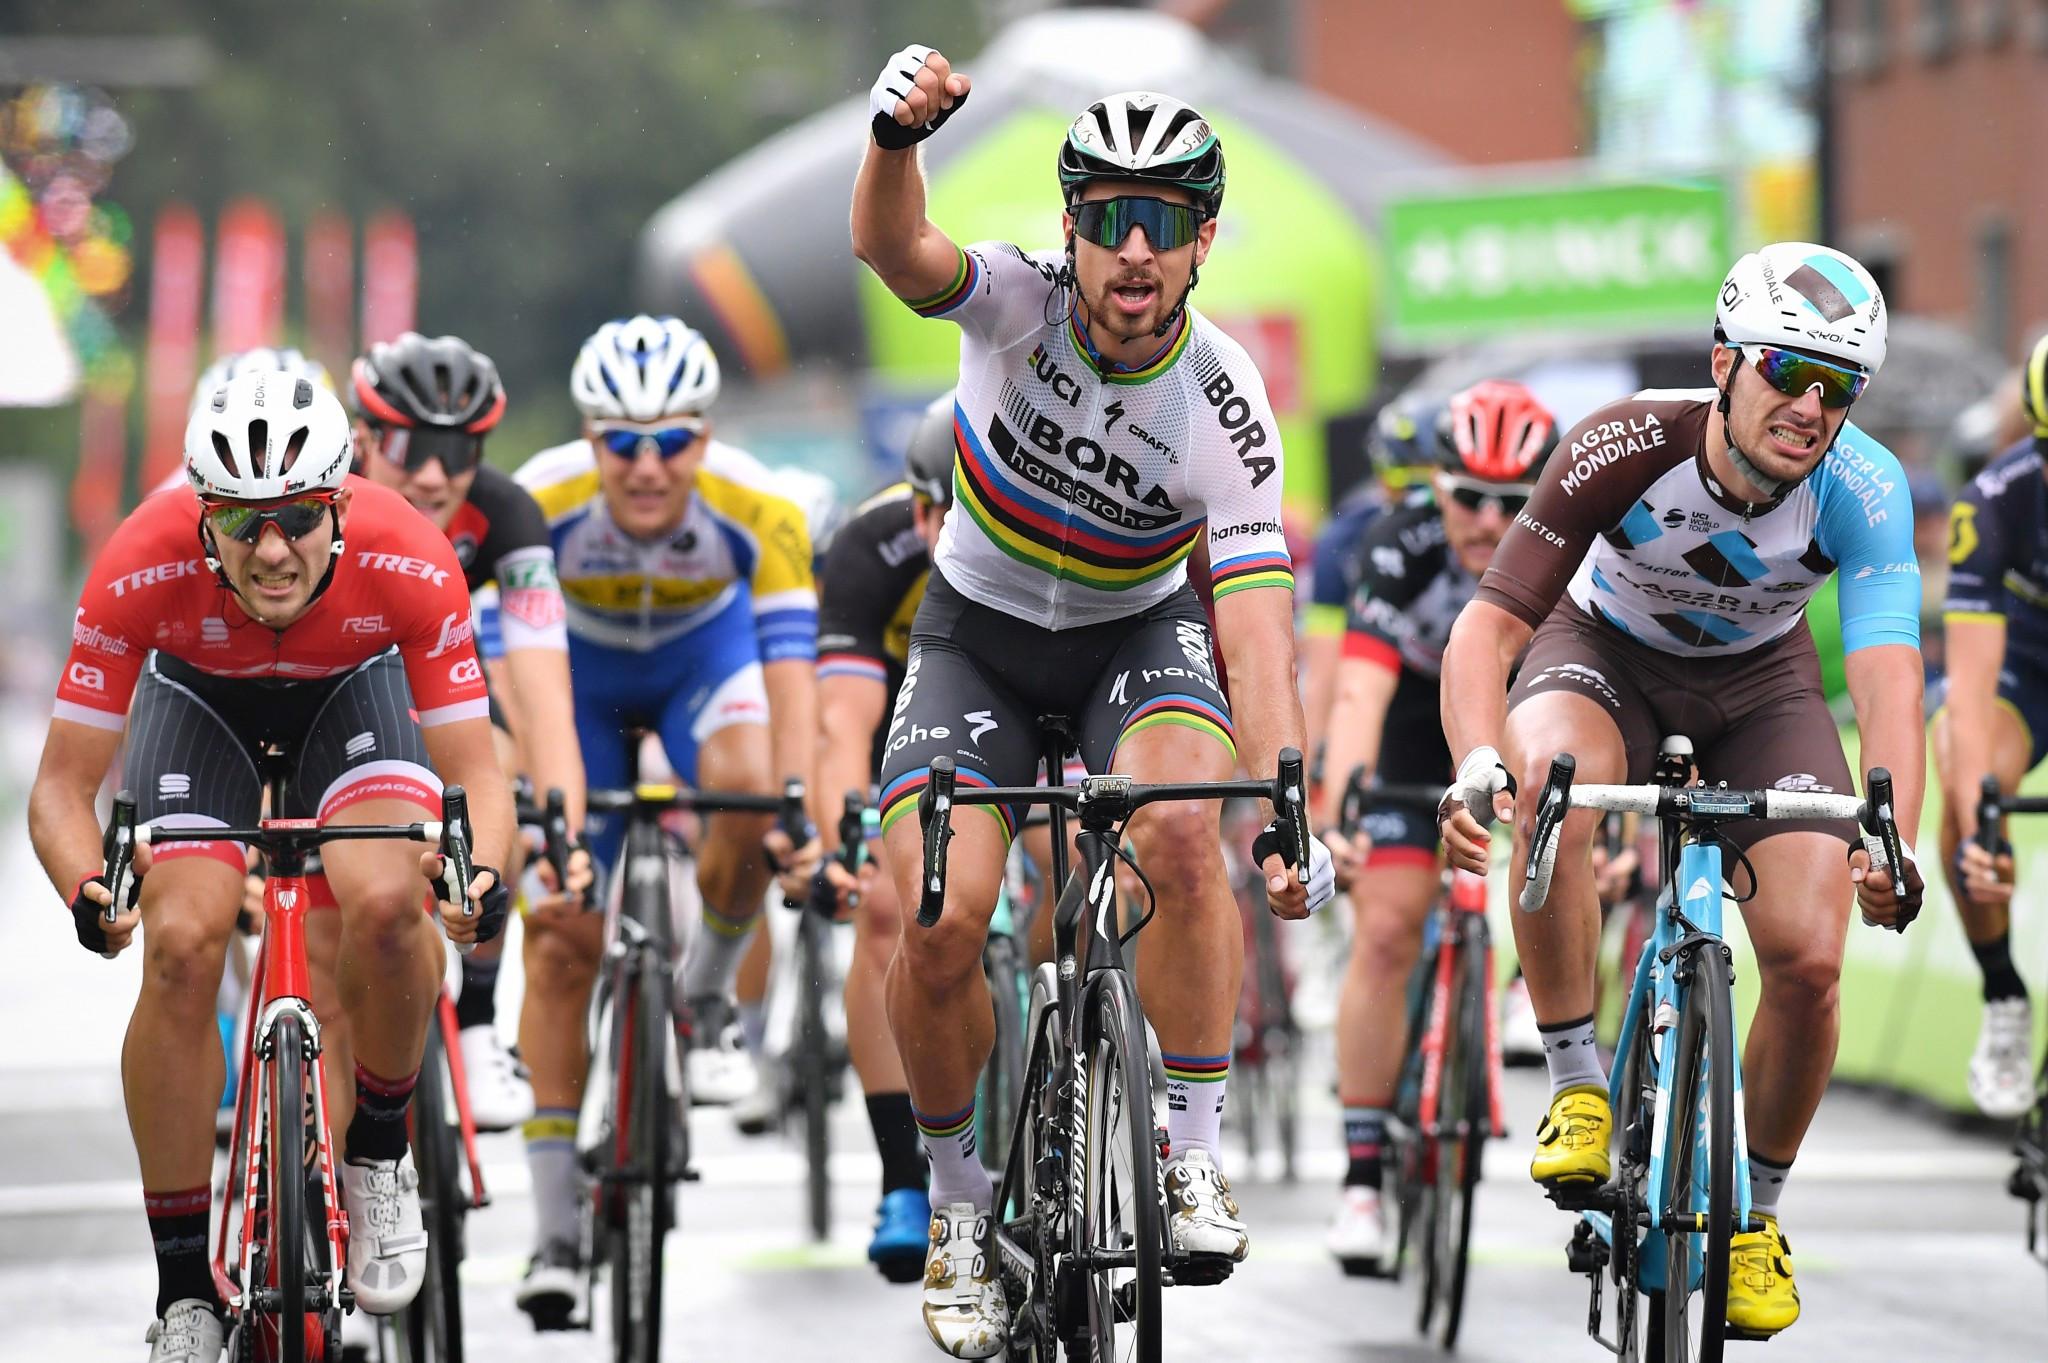 Peter Sagan won the third stage of the BinckBank Tour ©Getty Images